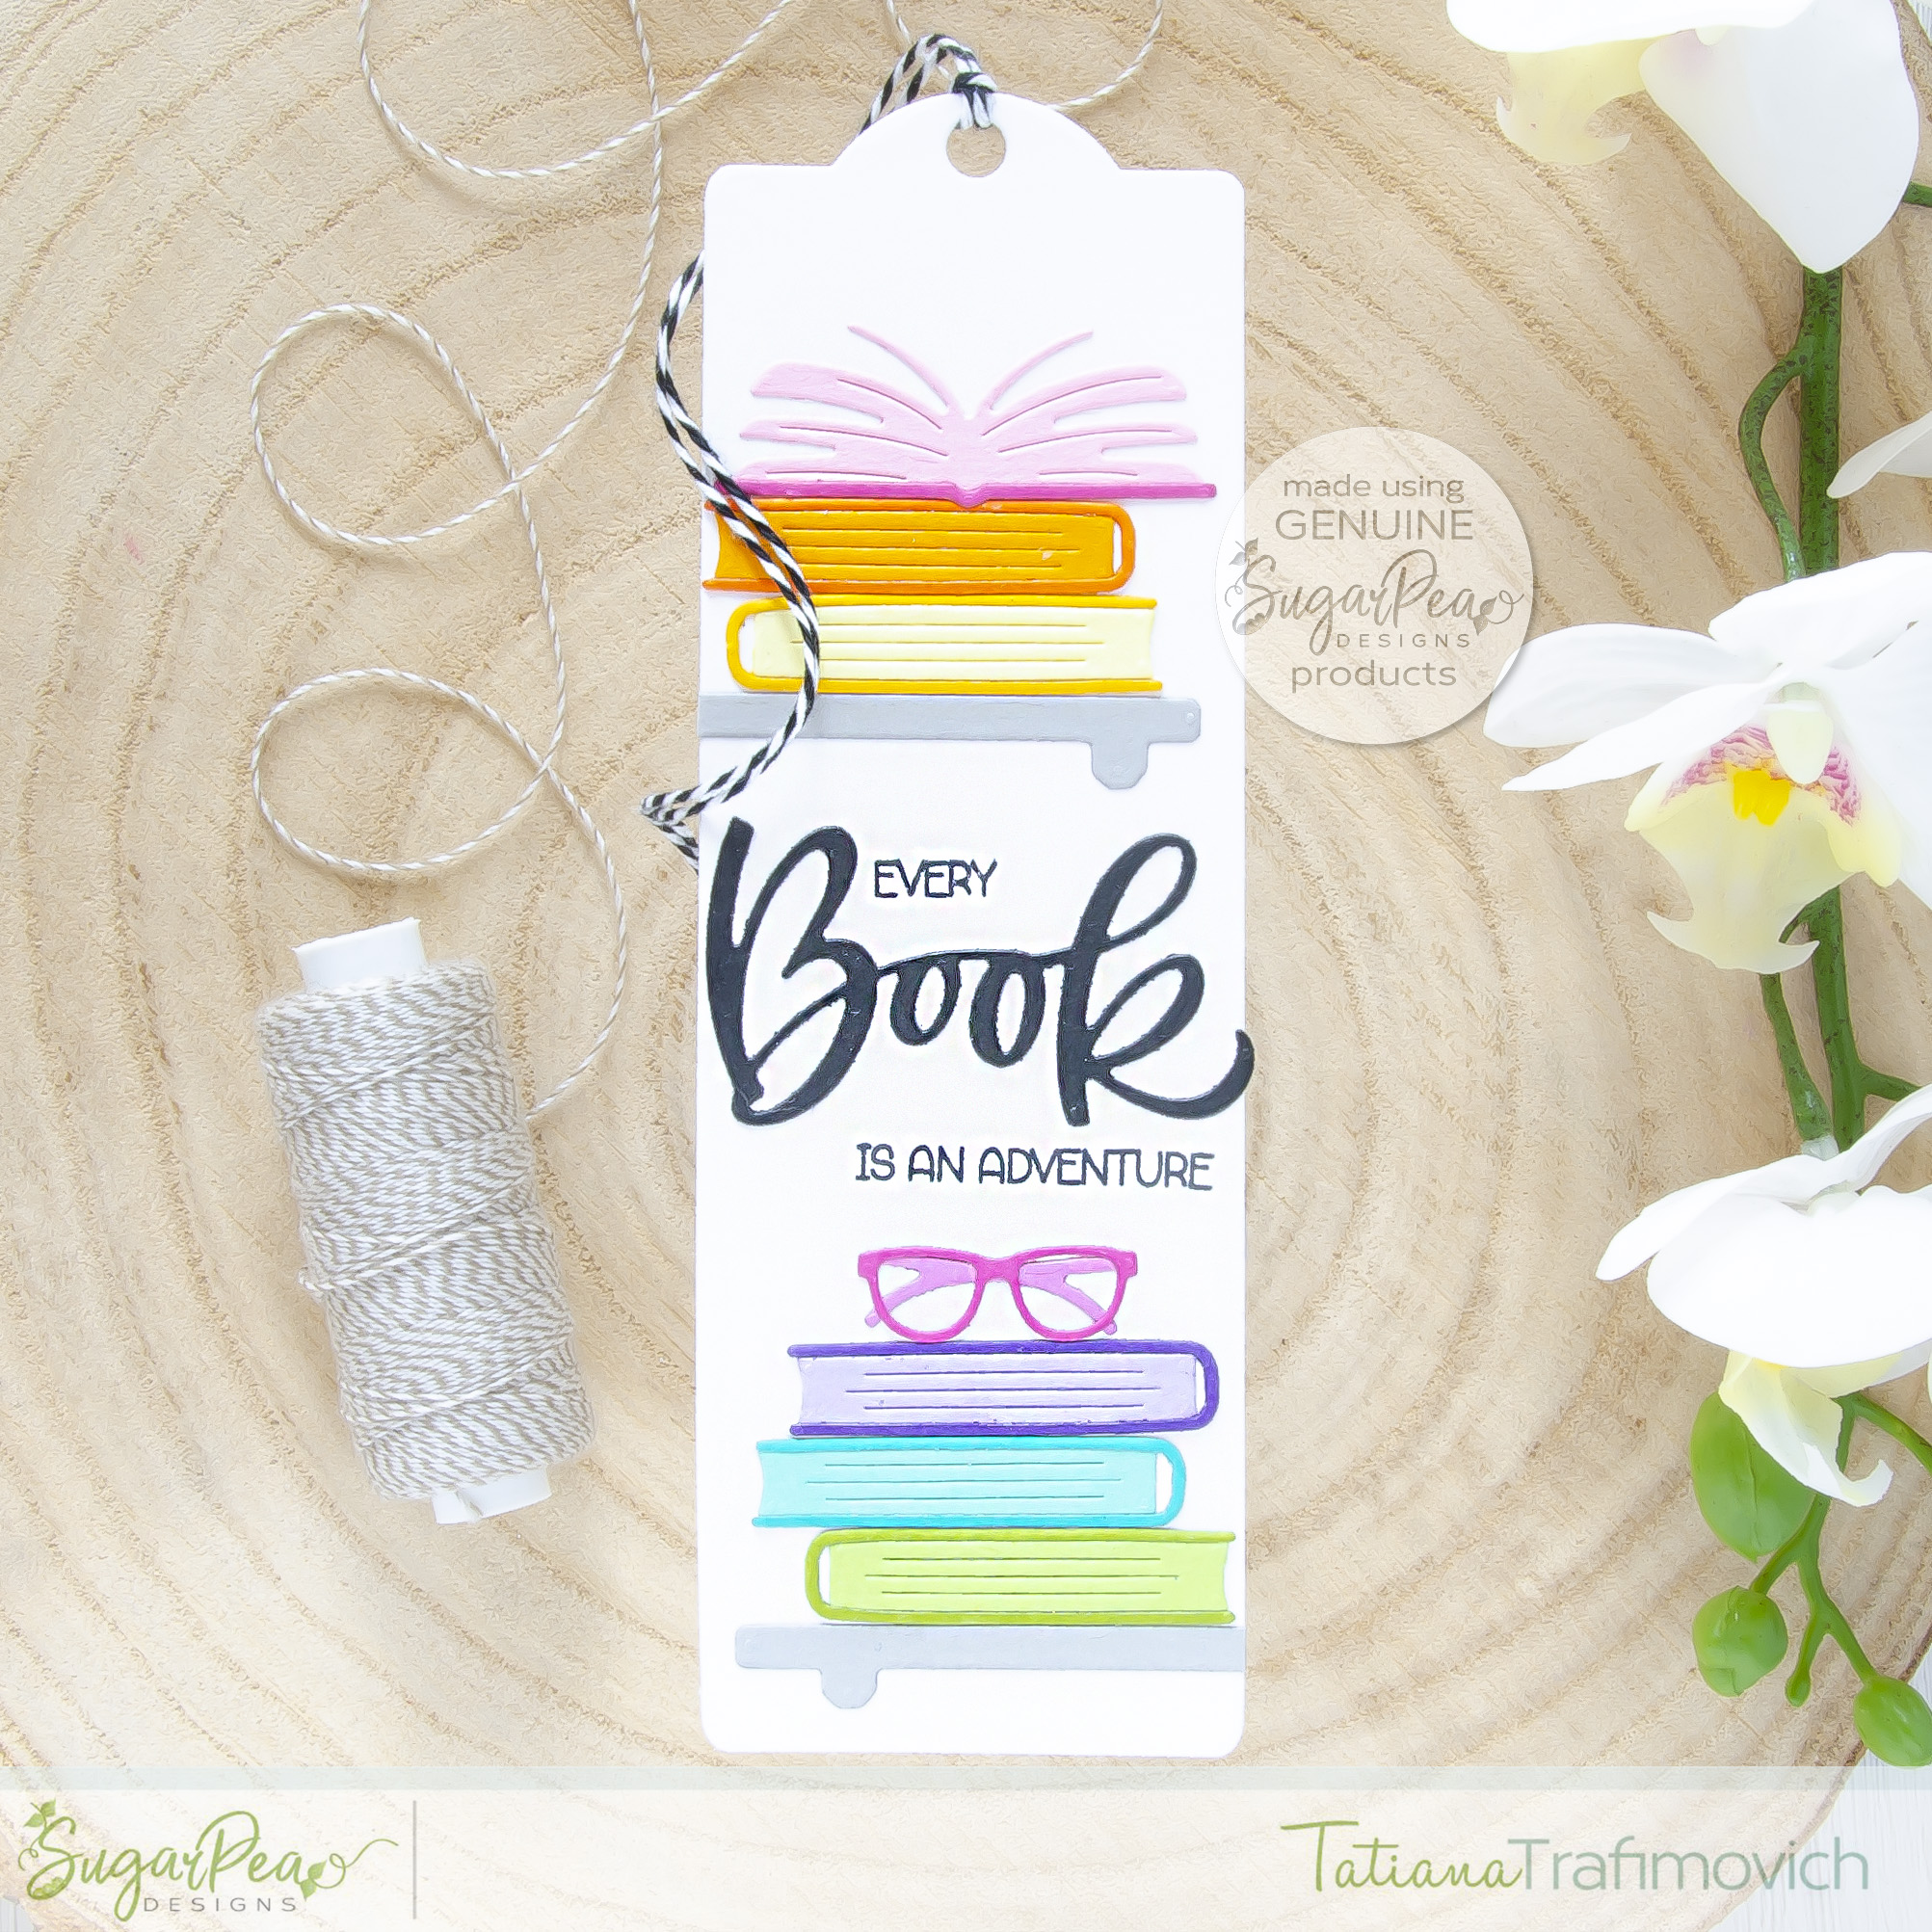 Every Book Is An Adventure #handmade bookmark by Tatiana Trafimovich #tatianacraftandart - Basic Bookmark SugarCut by SugarPea Designs #sugarpeadesigns